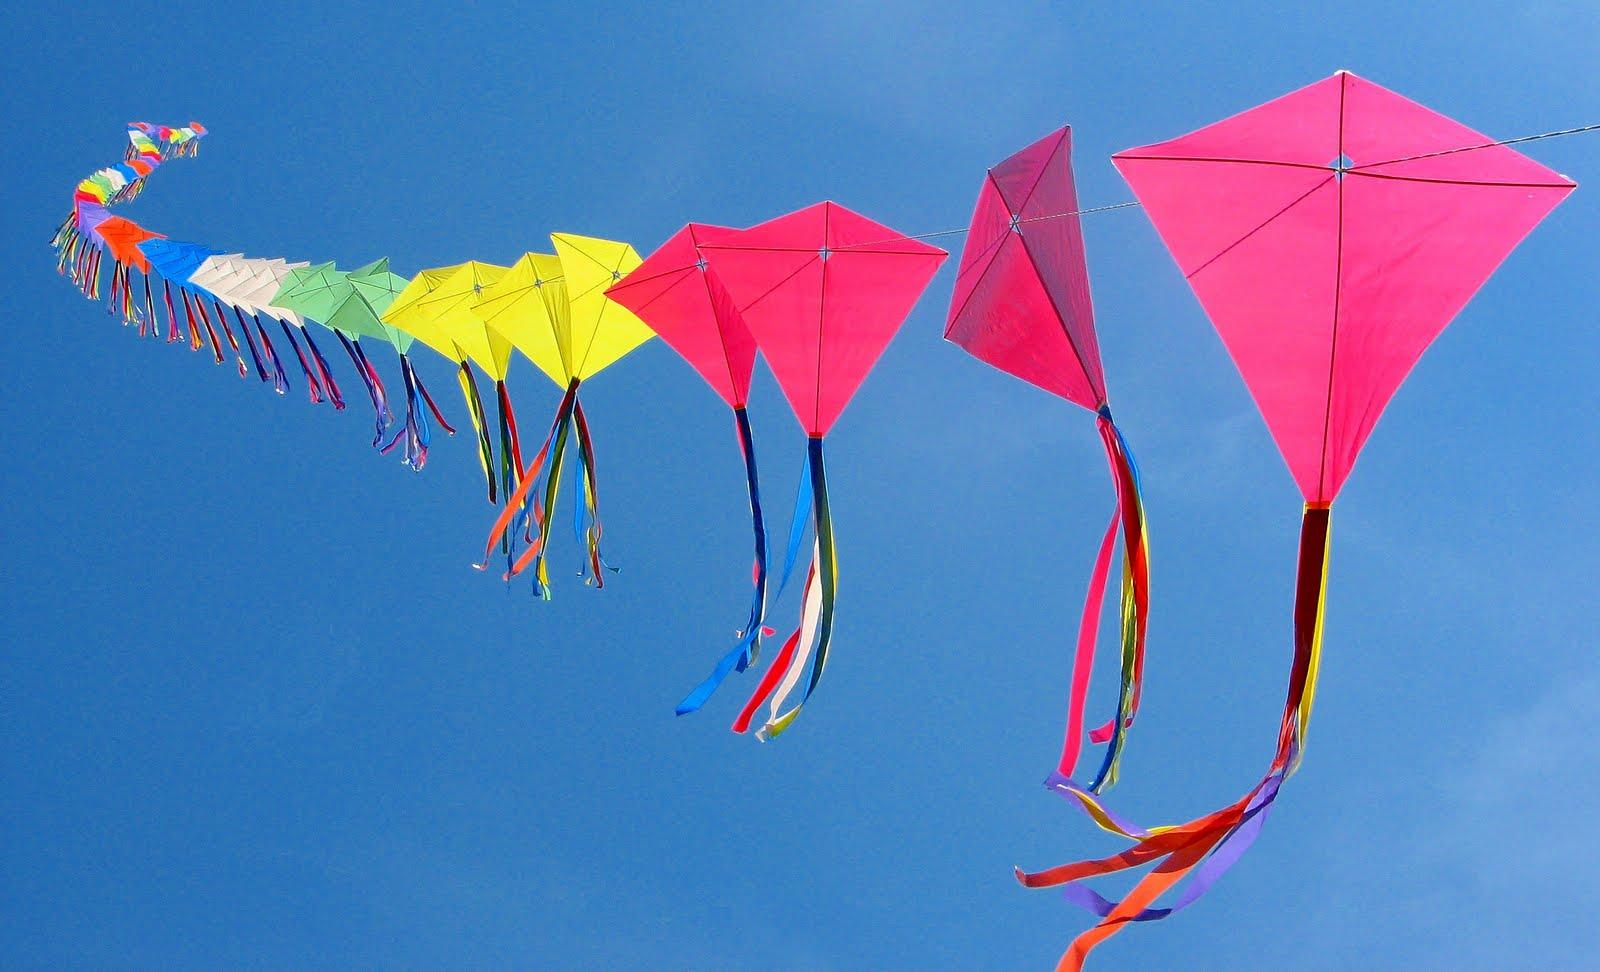 [عکس: kites_flying_images_1024x768_66461.jpg]